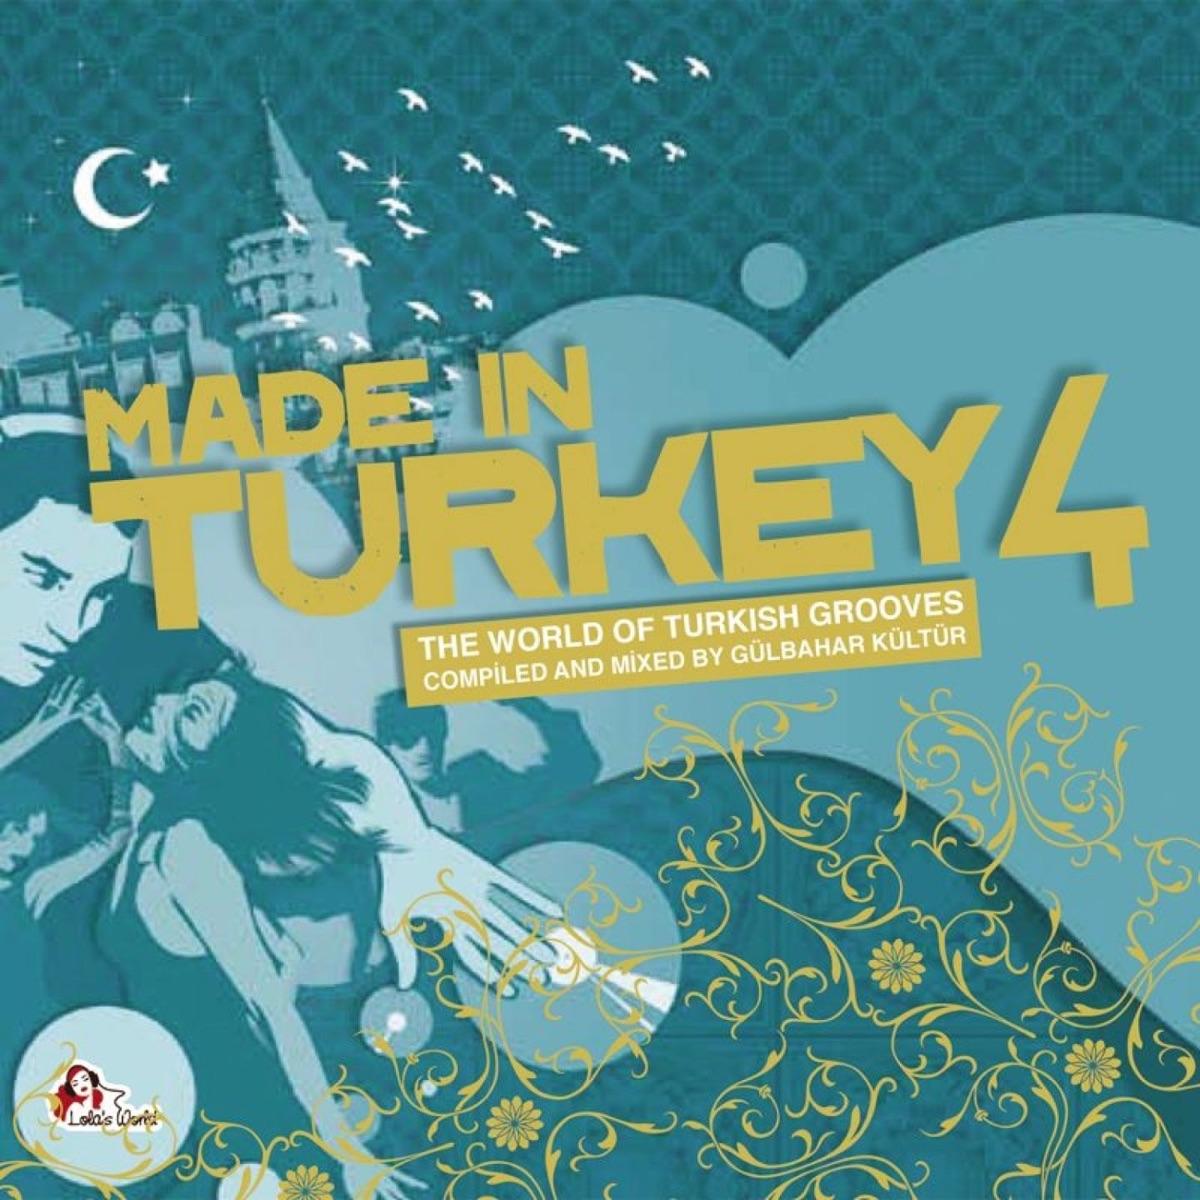 made in turkey, vol. 4 album cover by gülbahar kültür